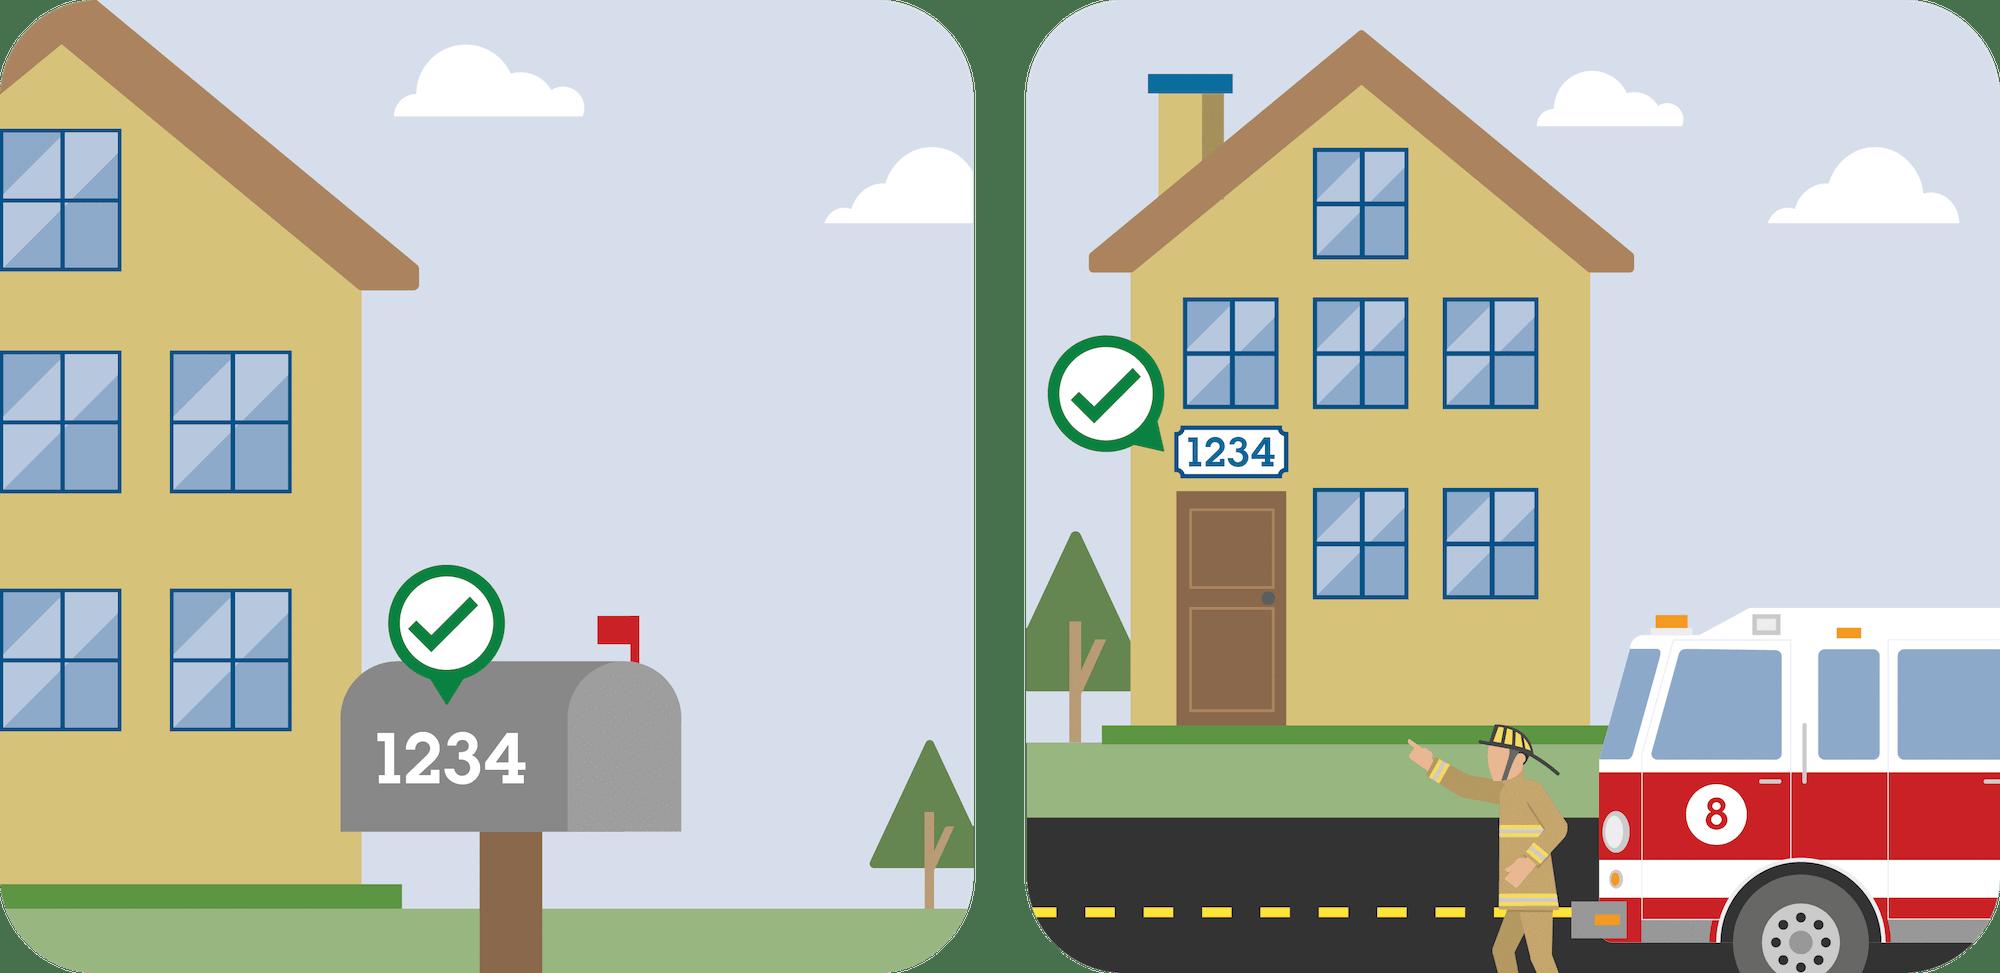 May contain: neighborhood, building, and urban